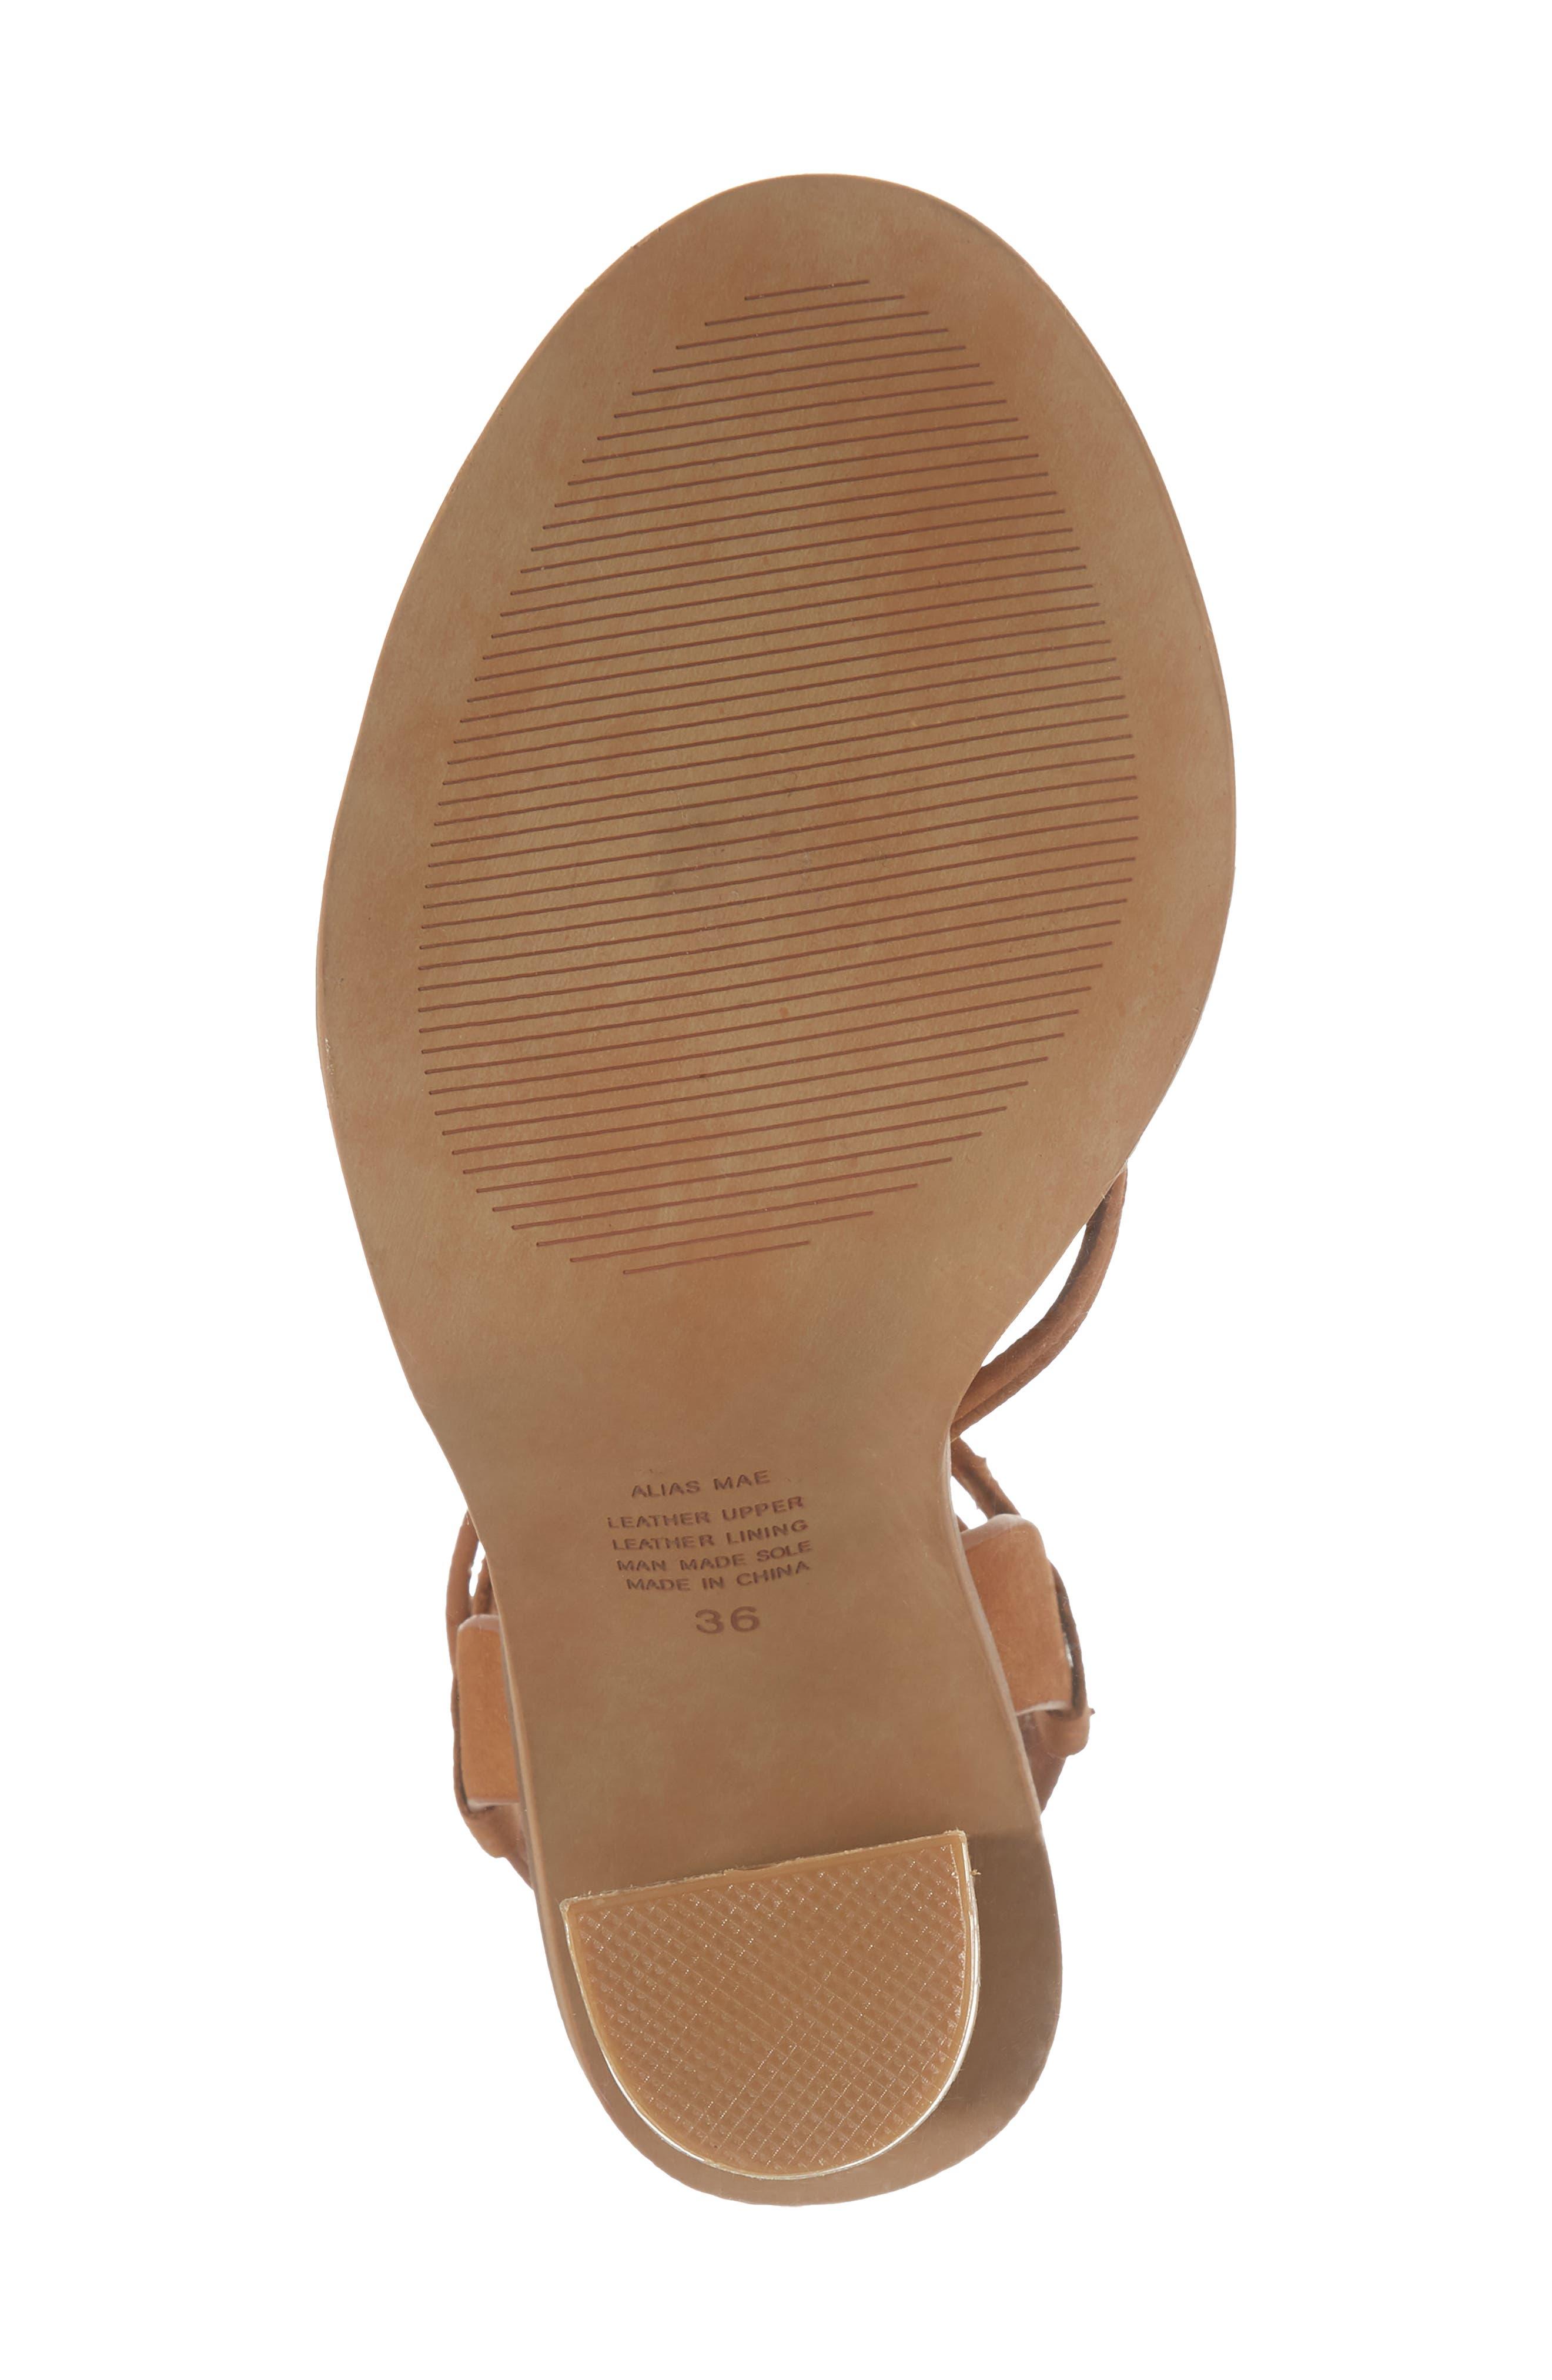 Adagio Sandal,                             Alternate thumbnail 6, color,                             Tan Leather